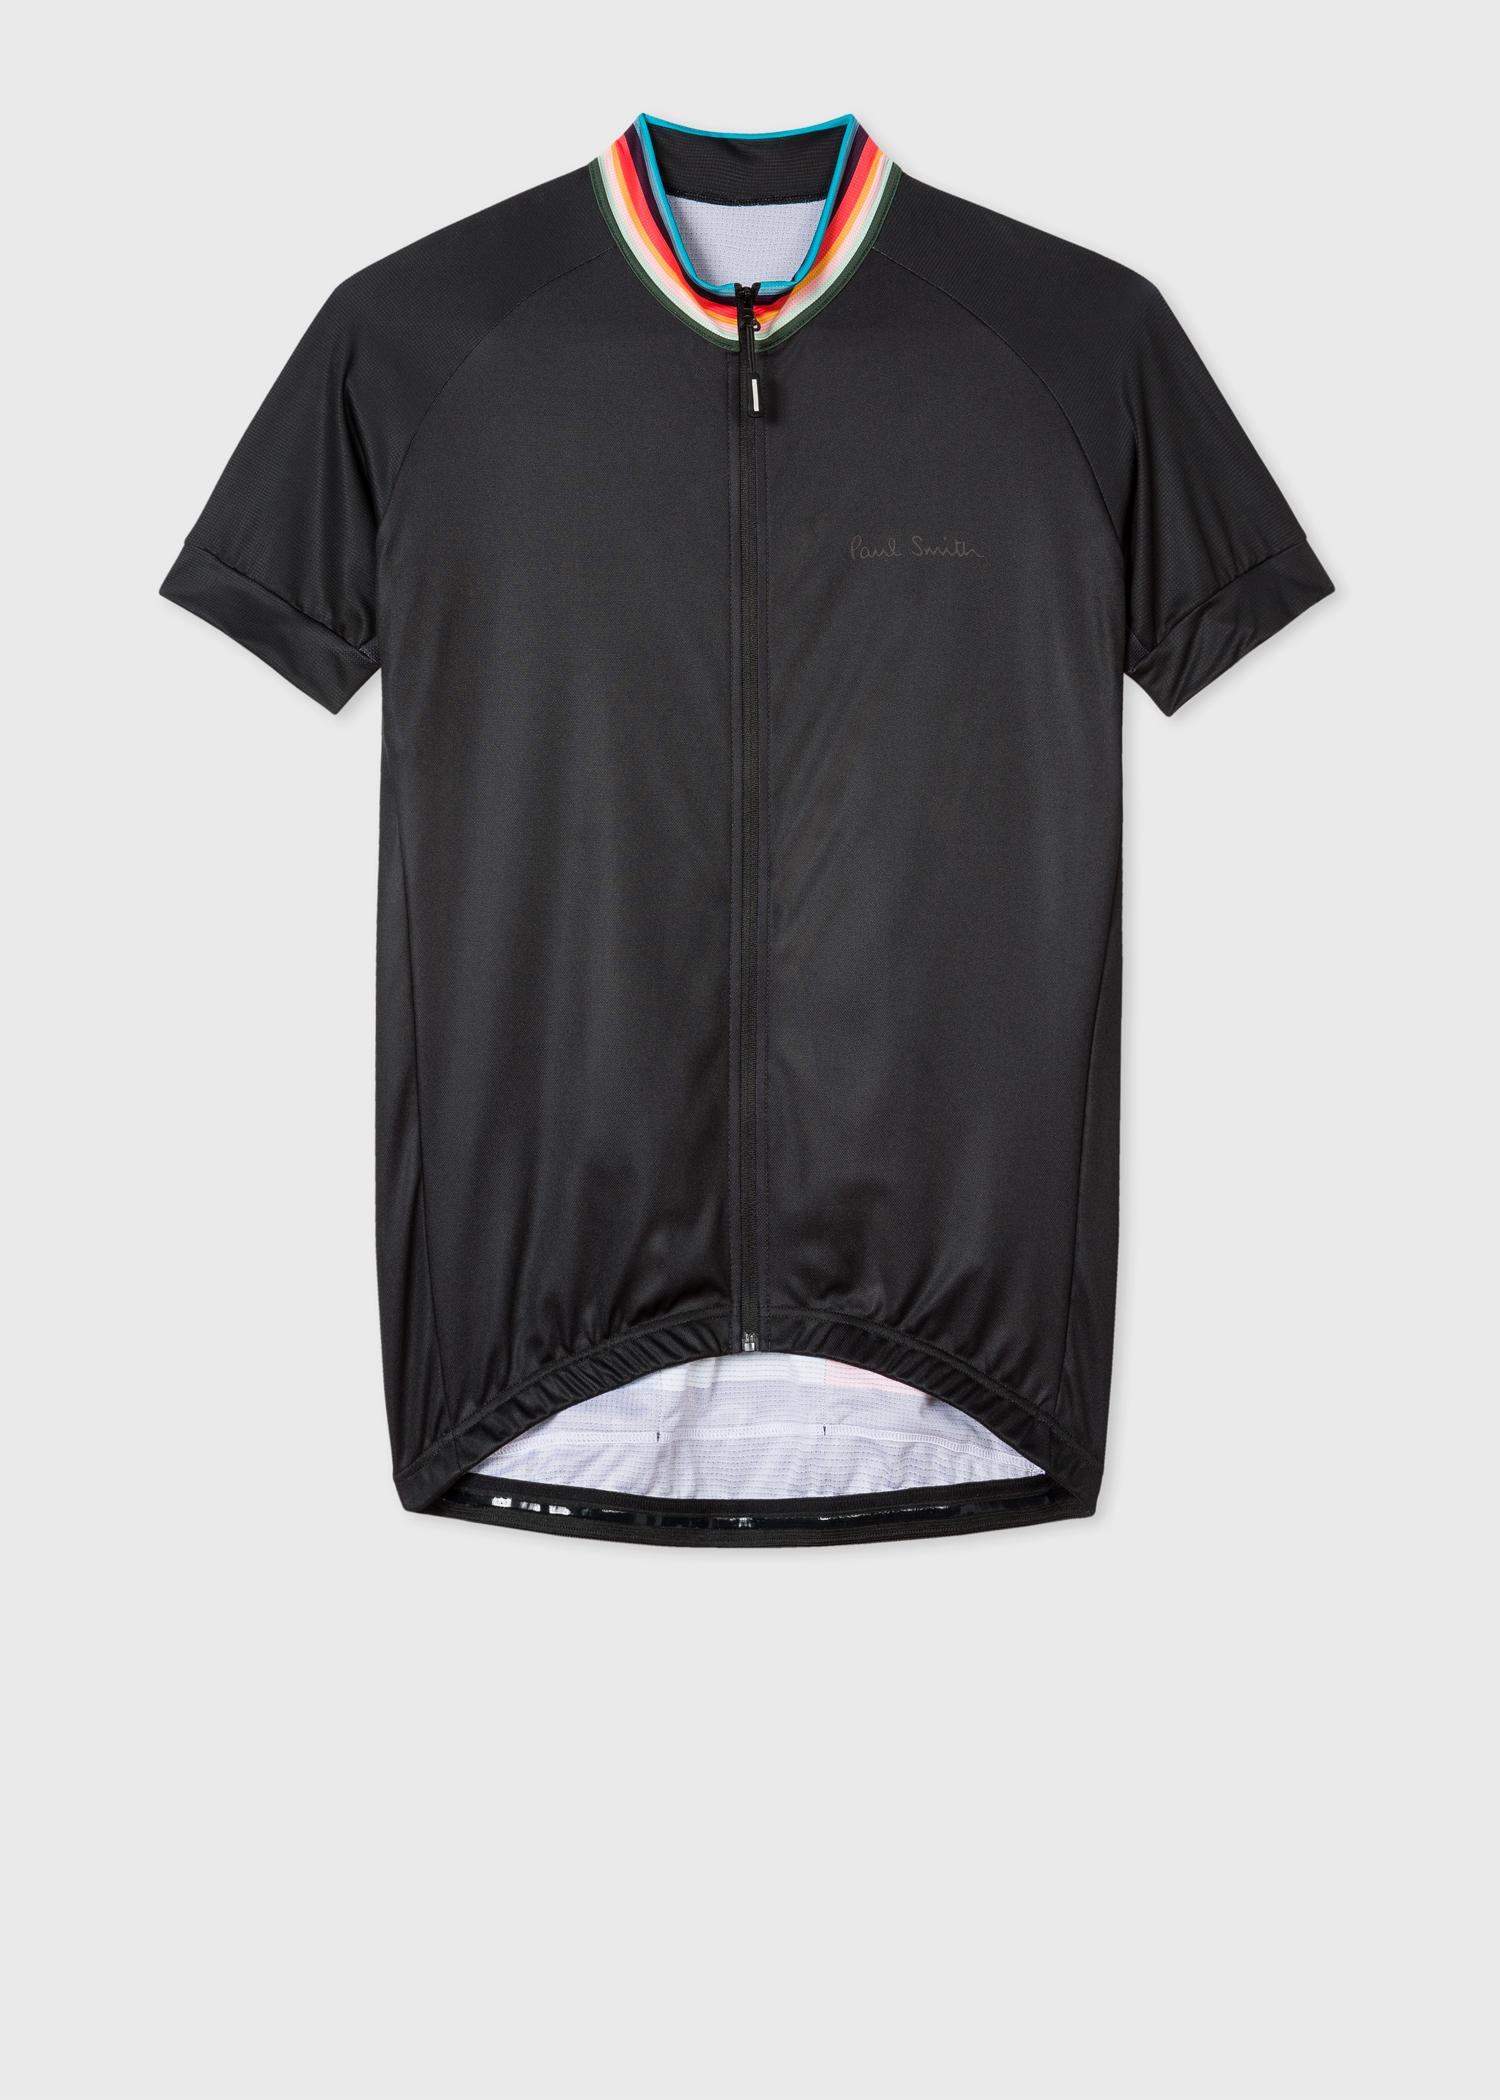 adb297d15 Black Cycling Jersey With  Artist Stripe  Collar - Paul Smith